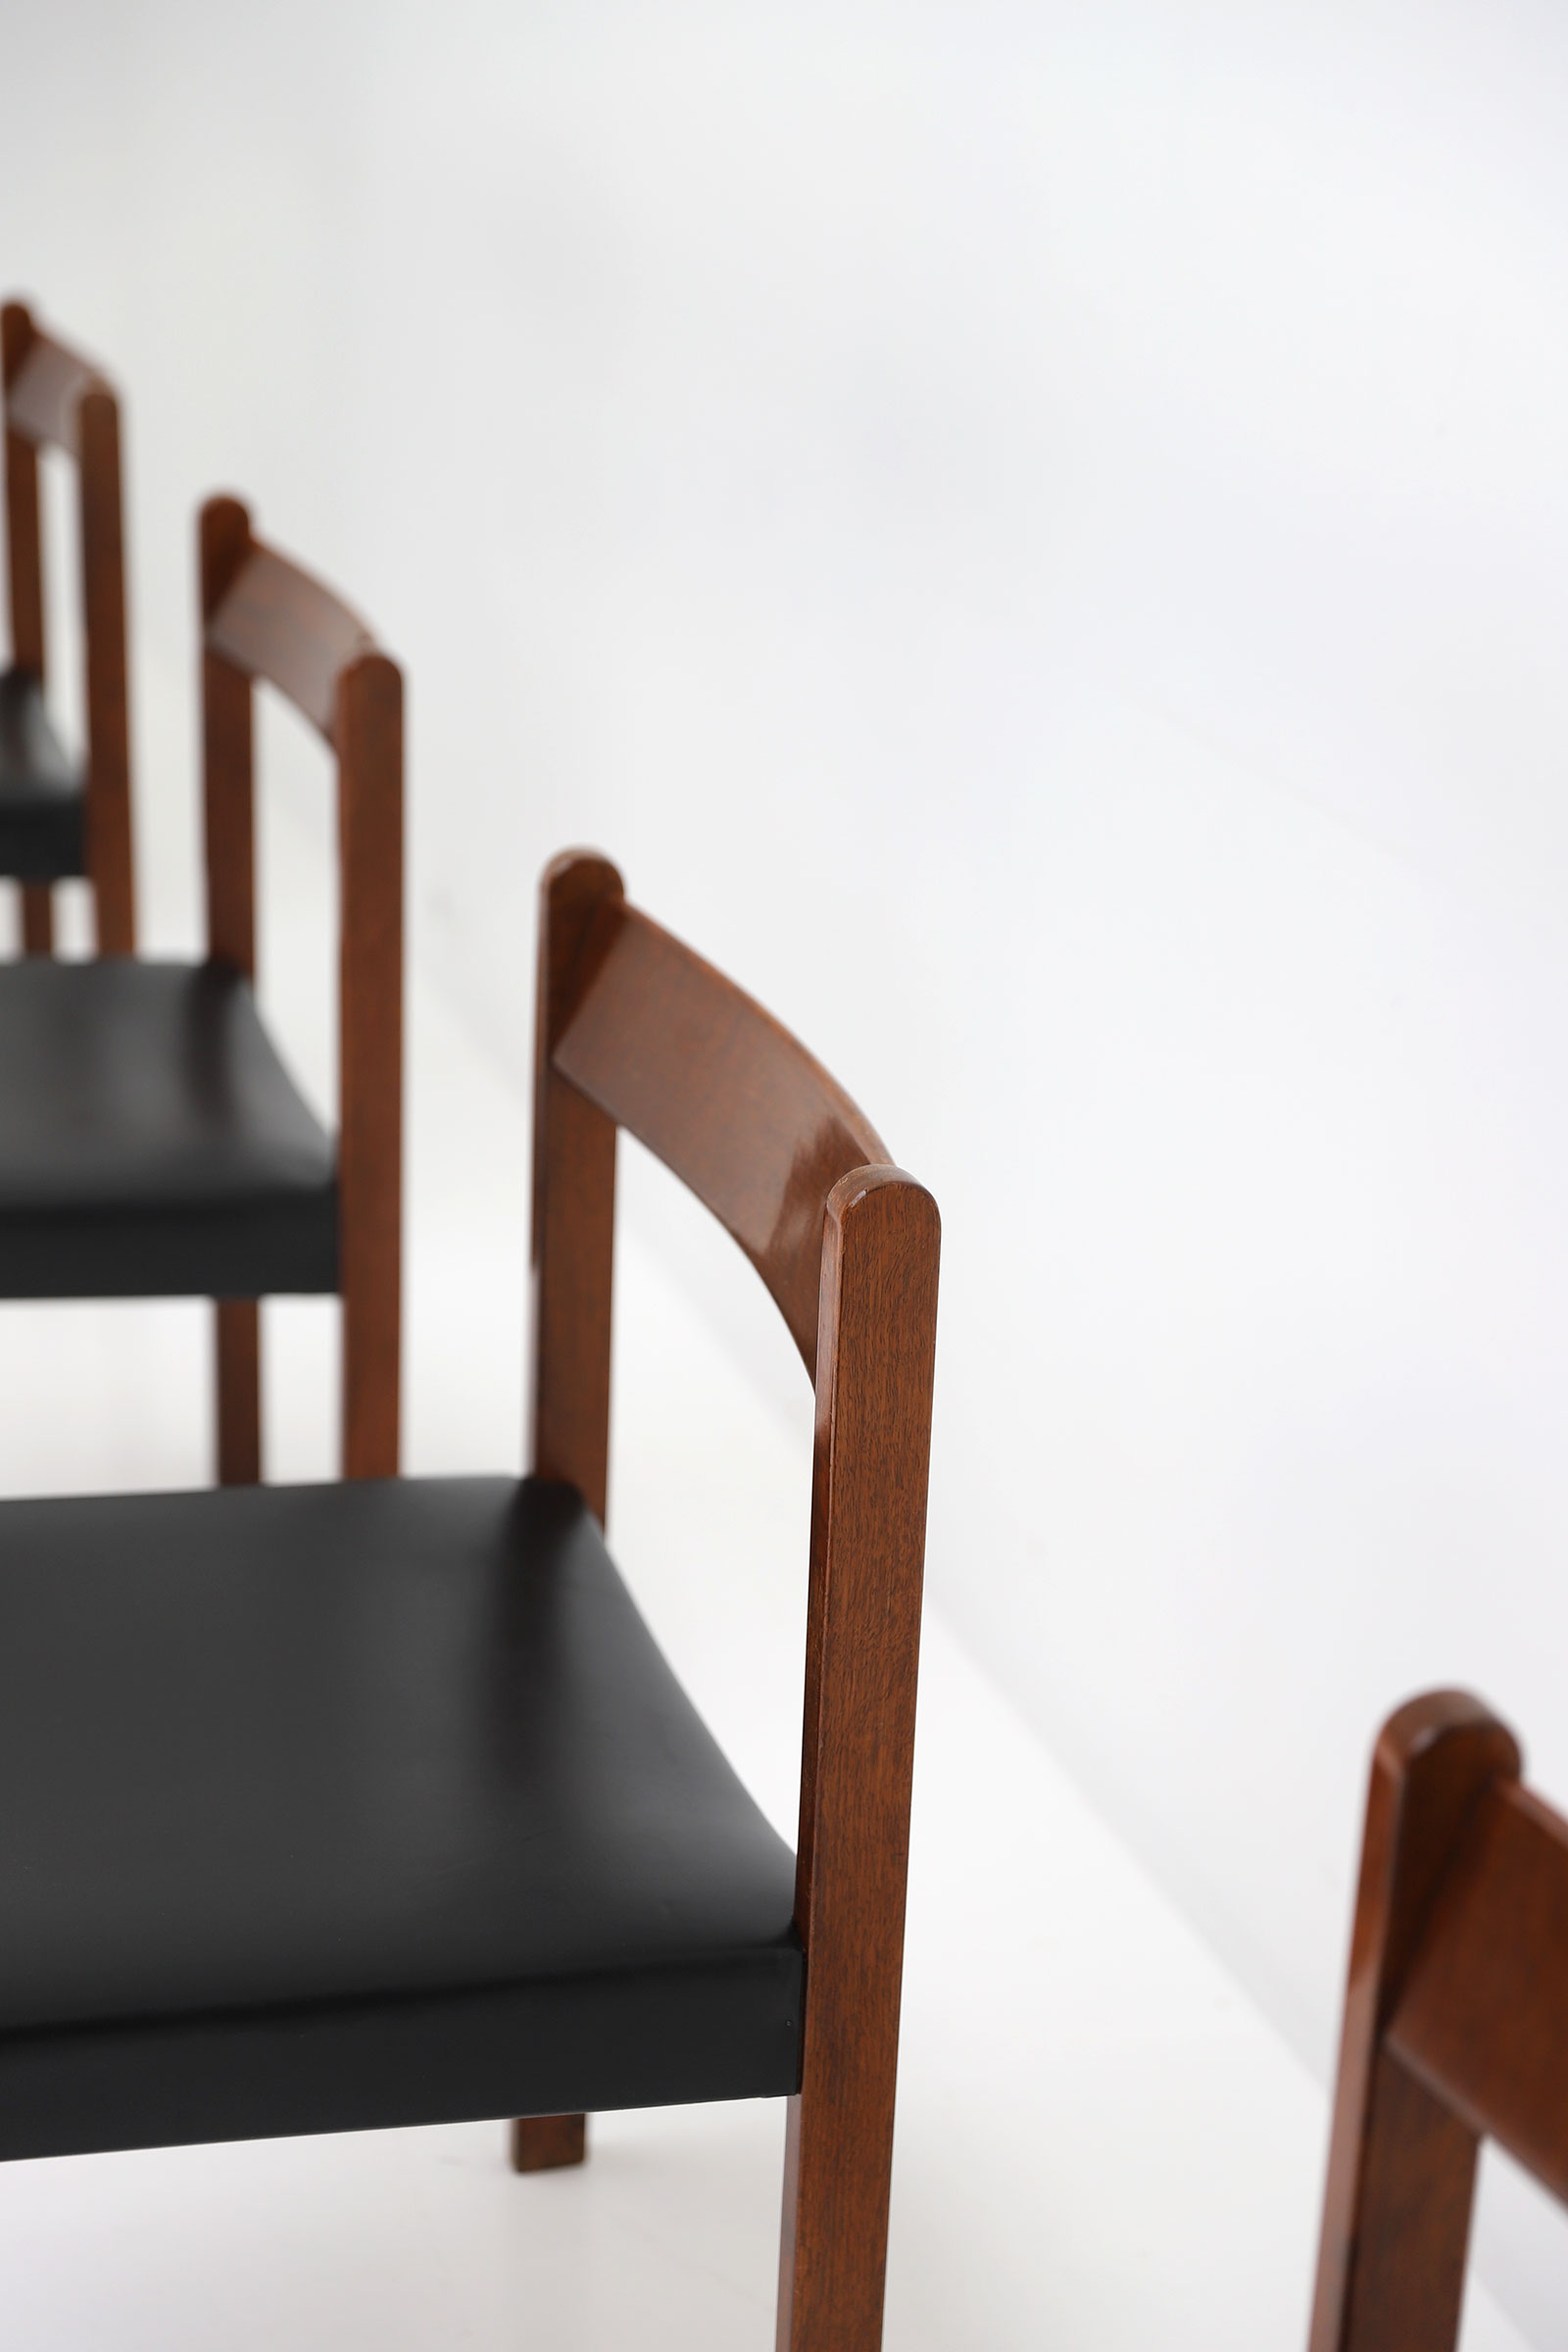 Alfred Hendrickx Belform Chairsimage 6